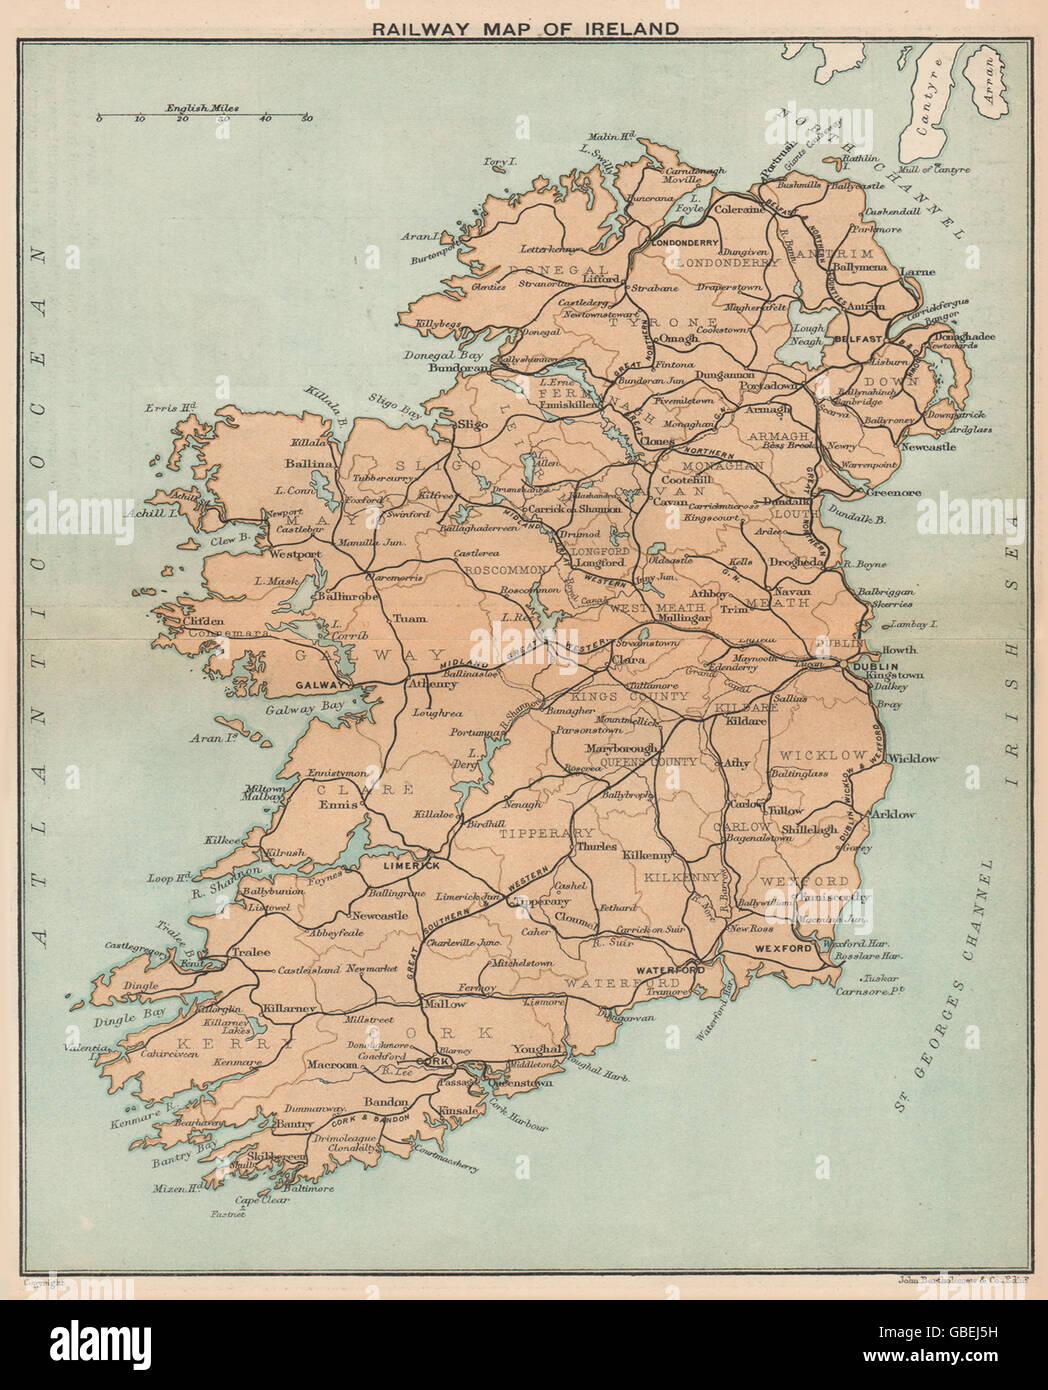 Rail Map Of Ireland.Ireland Railway Map Of Ireland Stanford 1908 Stock Photo